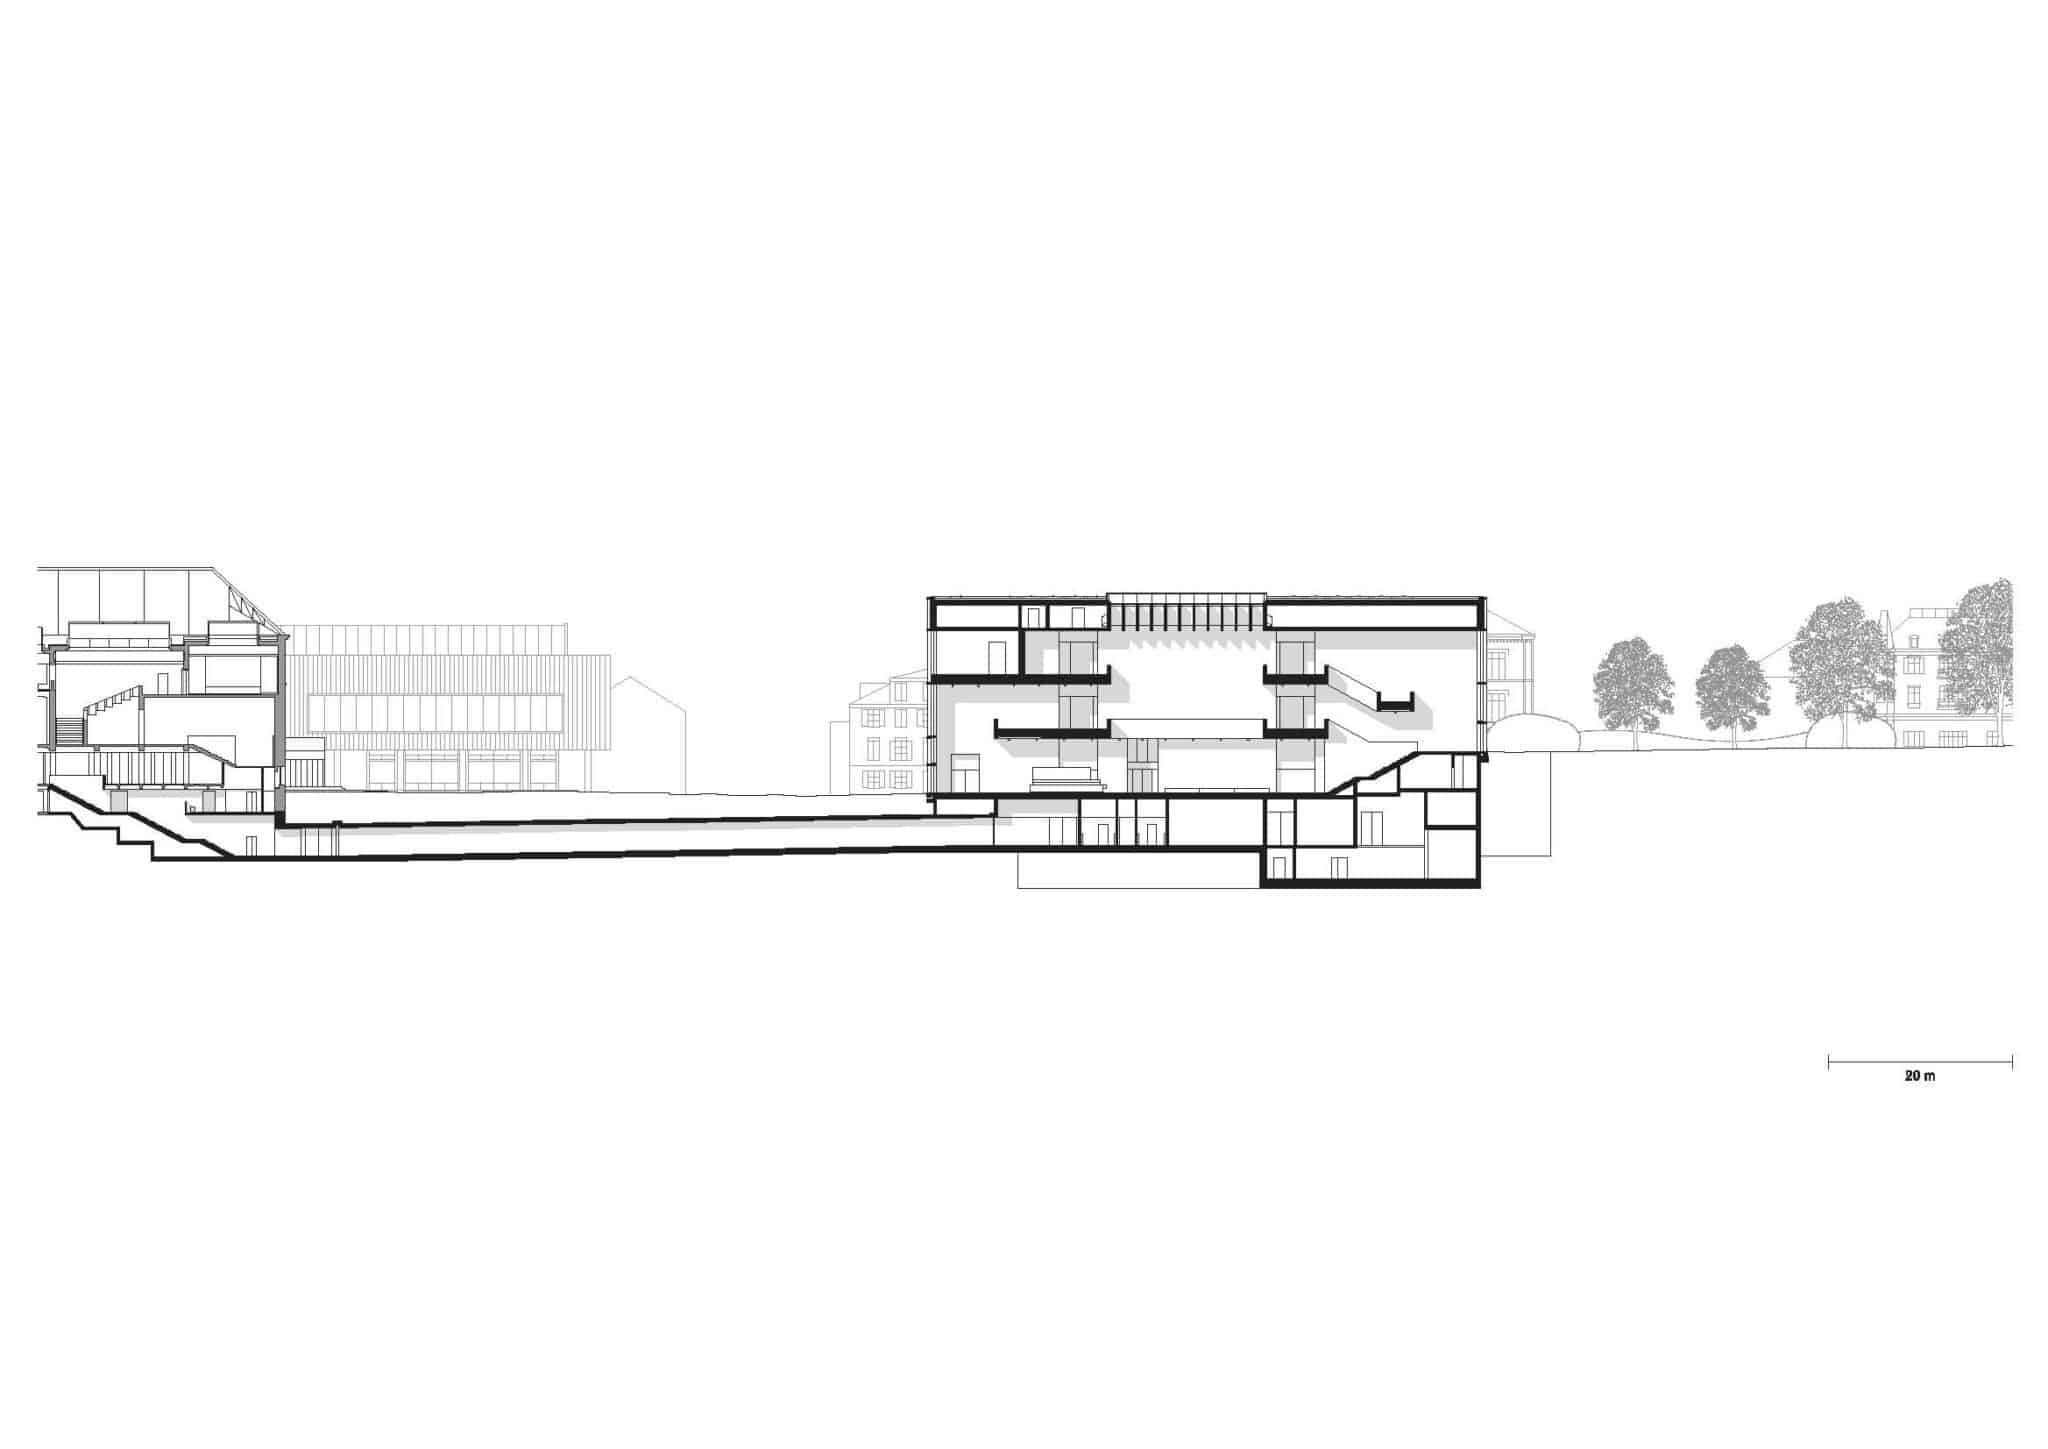 Kunsthaus Zürich  - 20210712 Chipperfield Kunsthaus 13.2 69